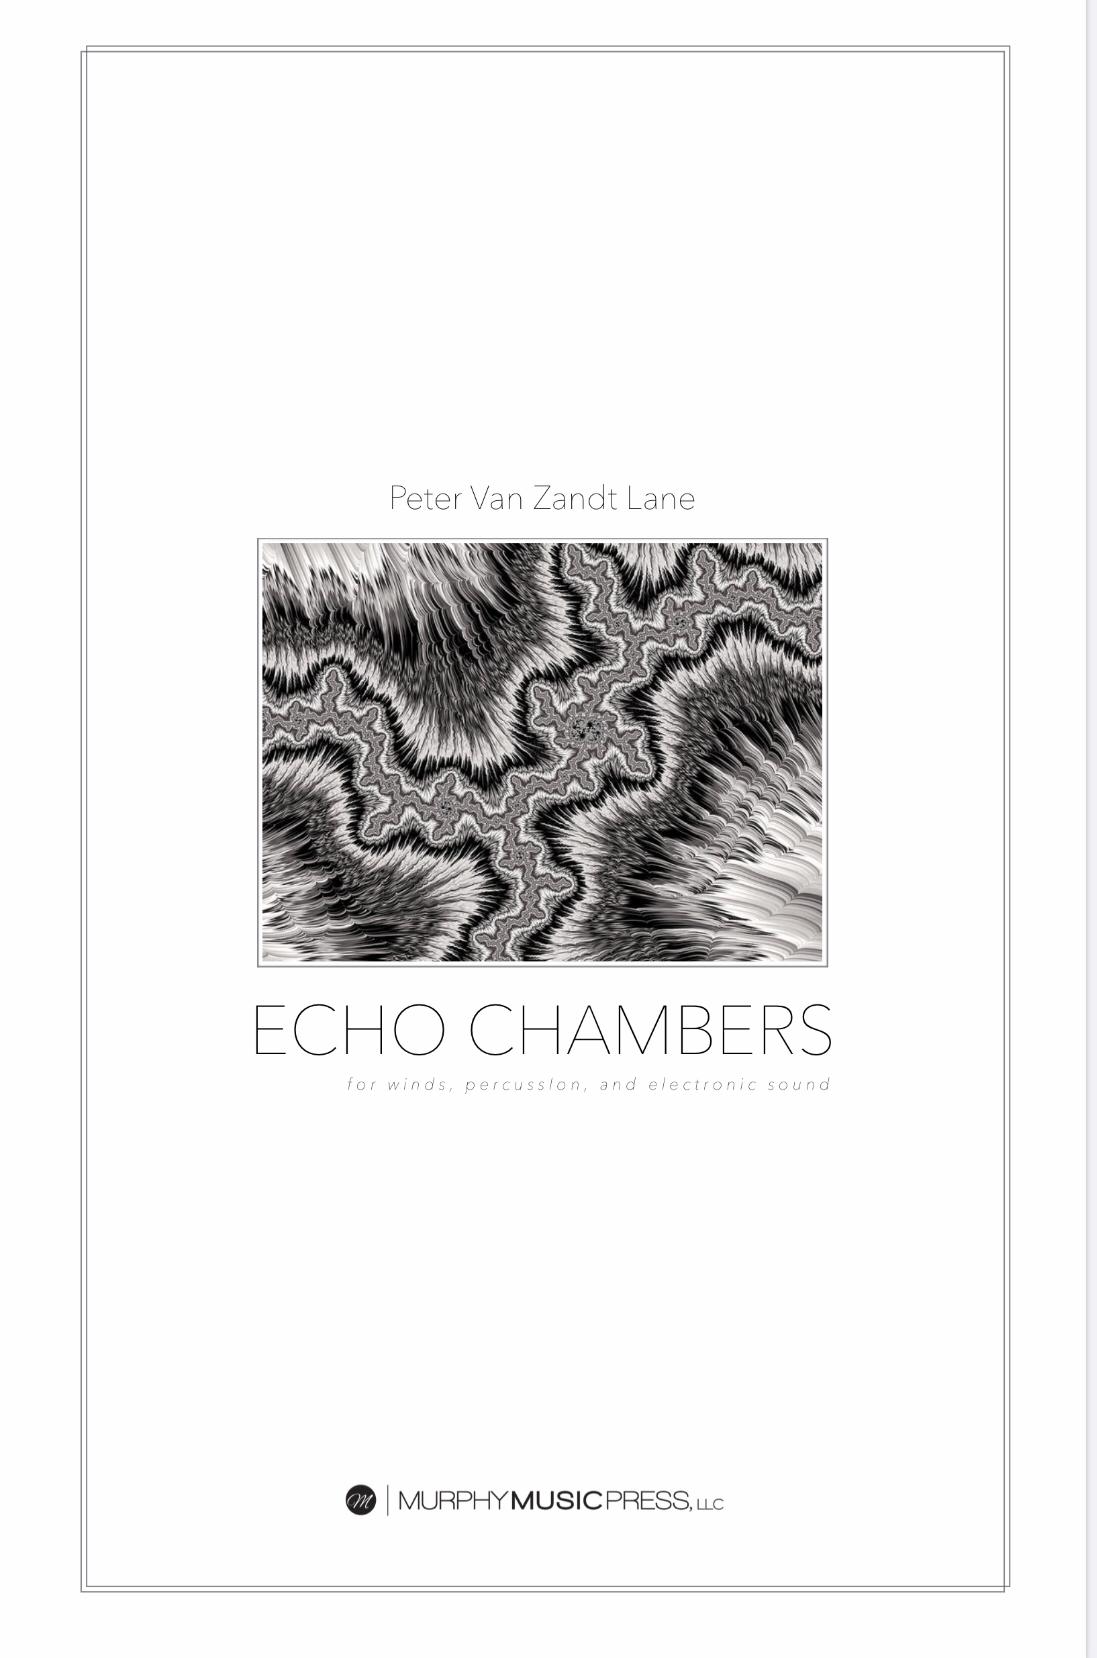 Echo Chambers by Peter Van Zandt Lane